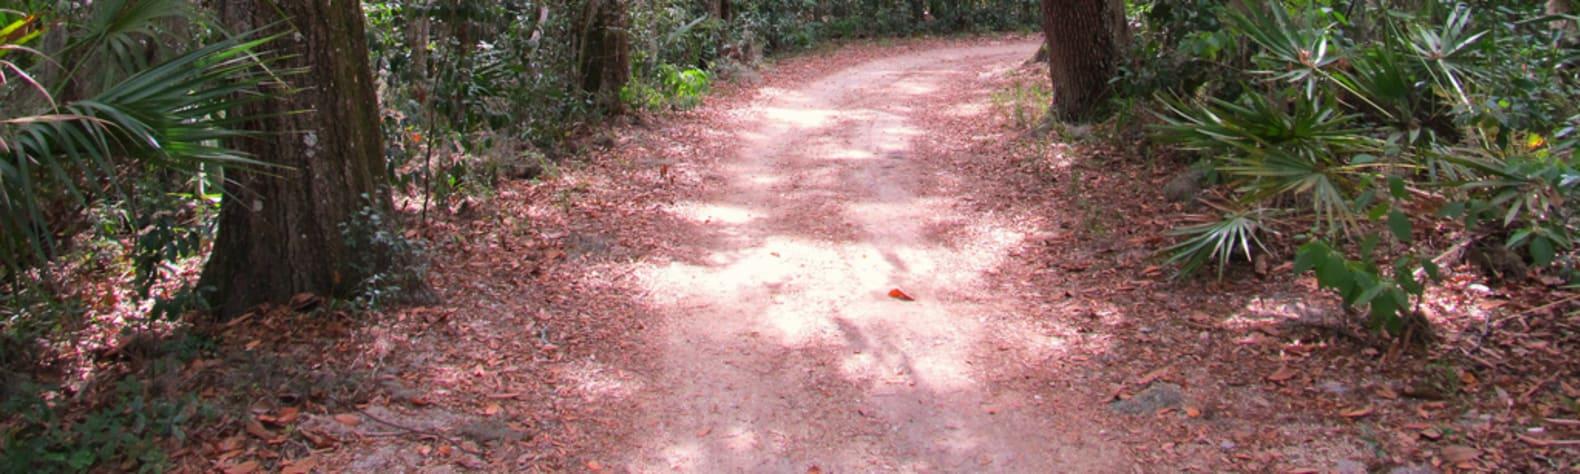 Timucuan Ecological & Historic Preserve